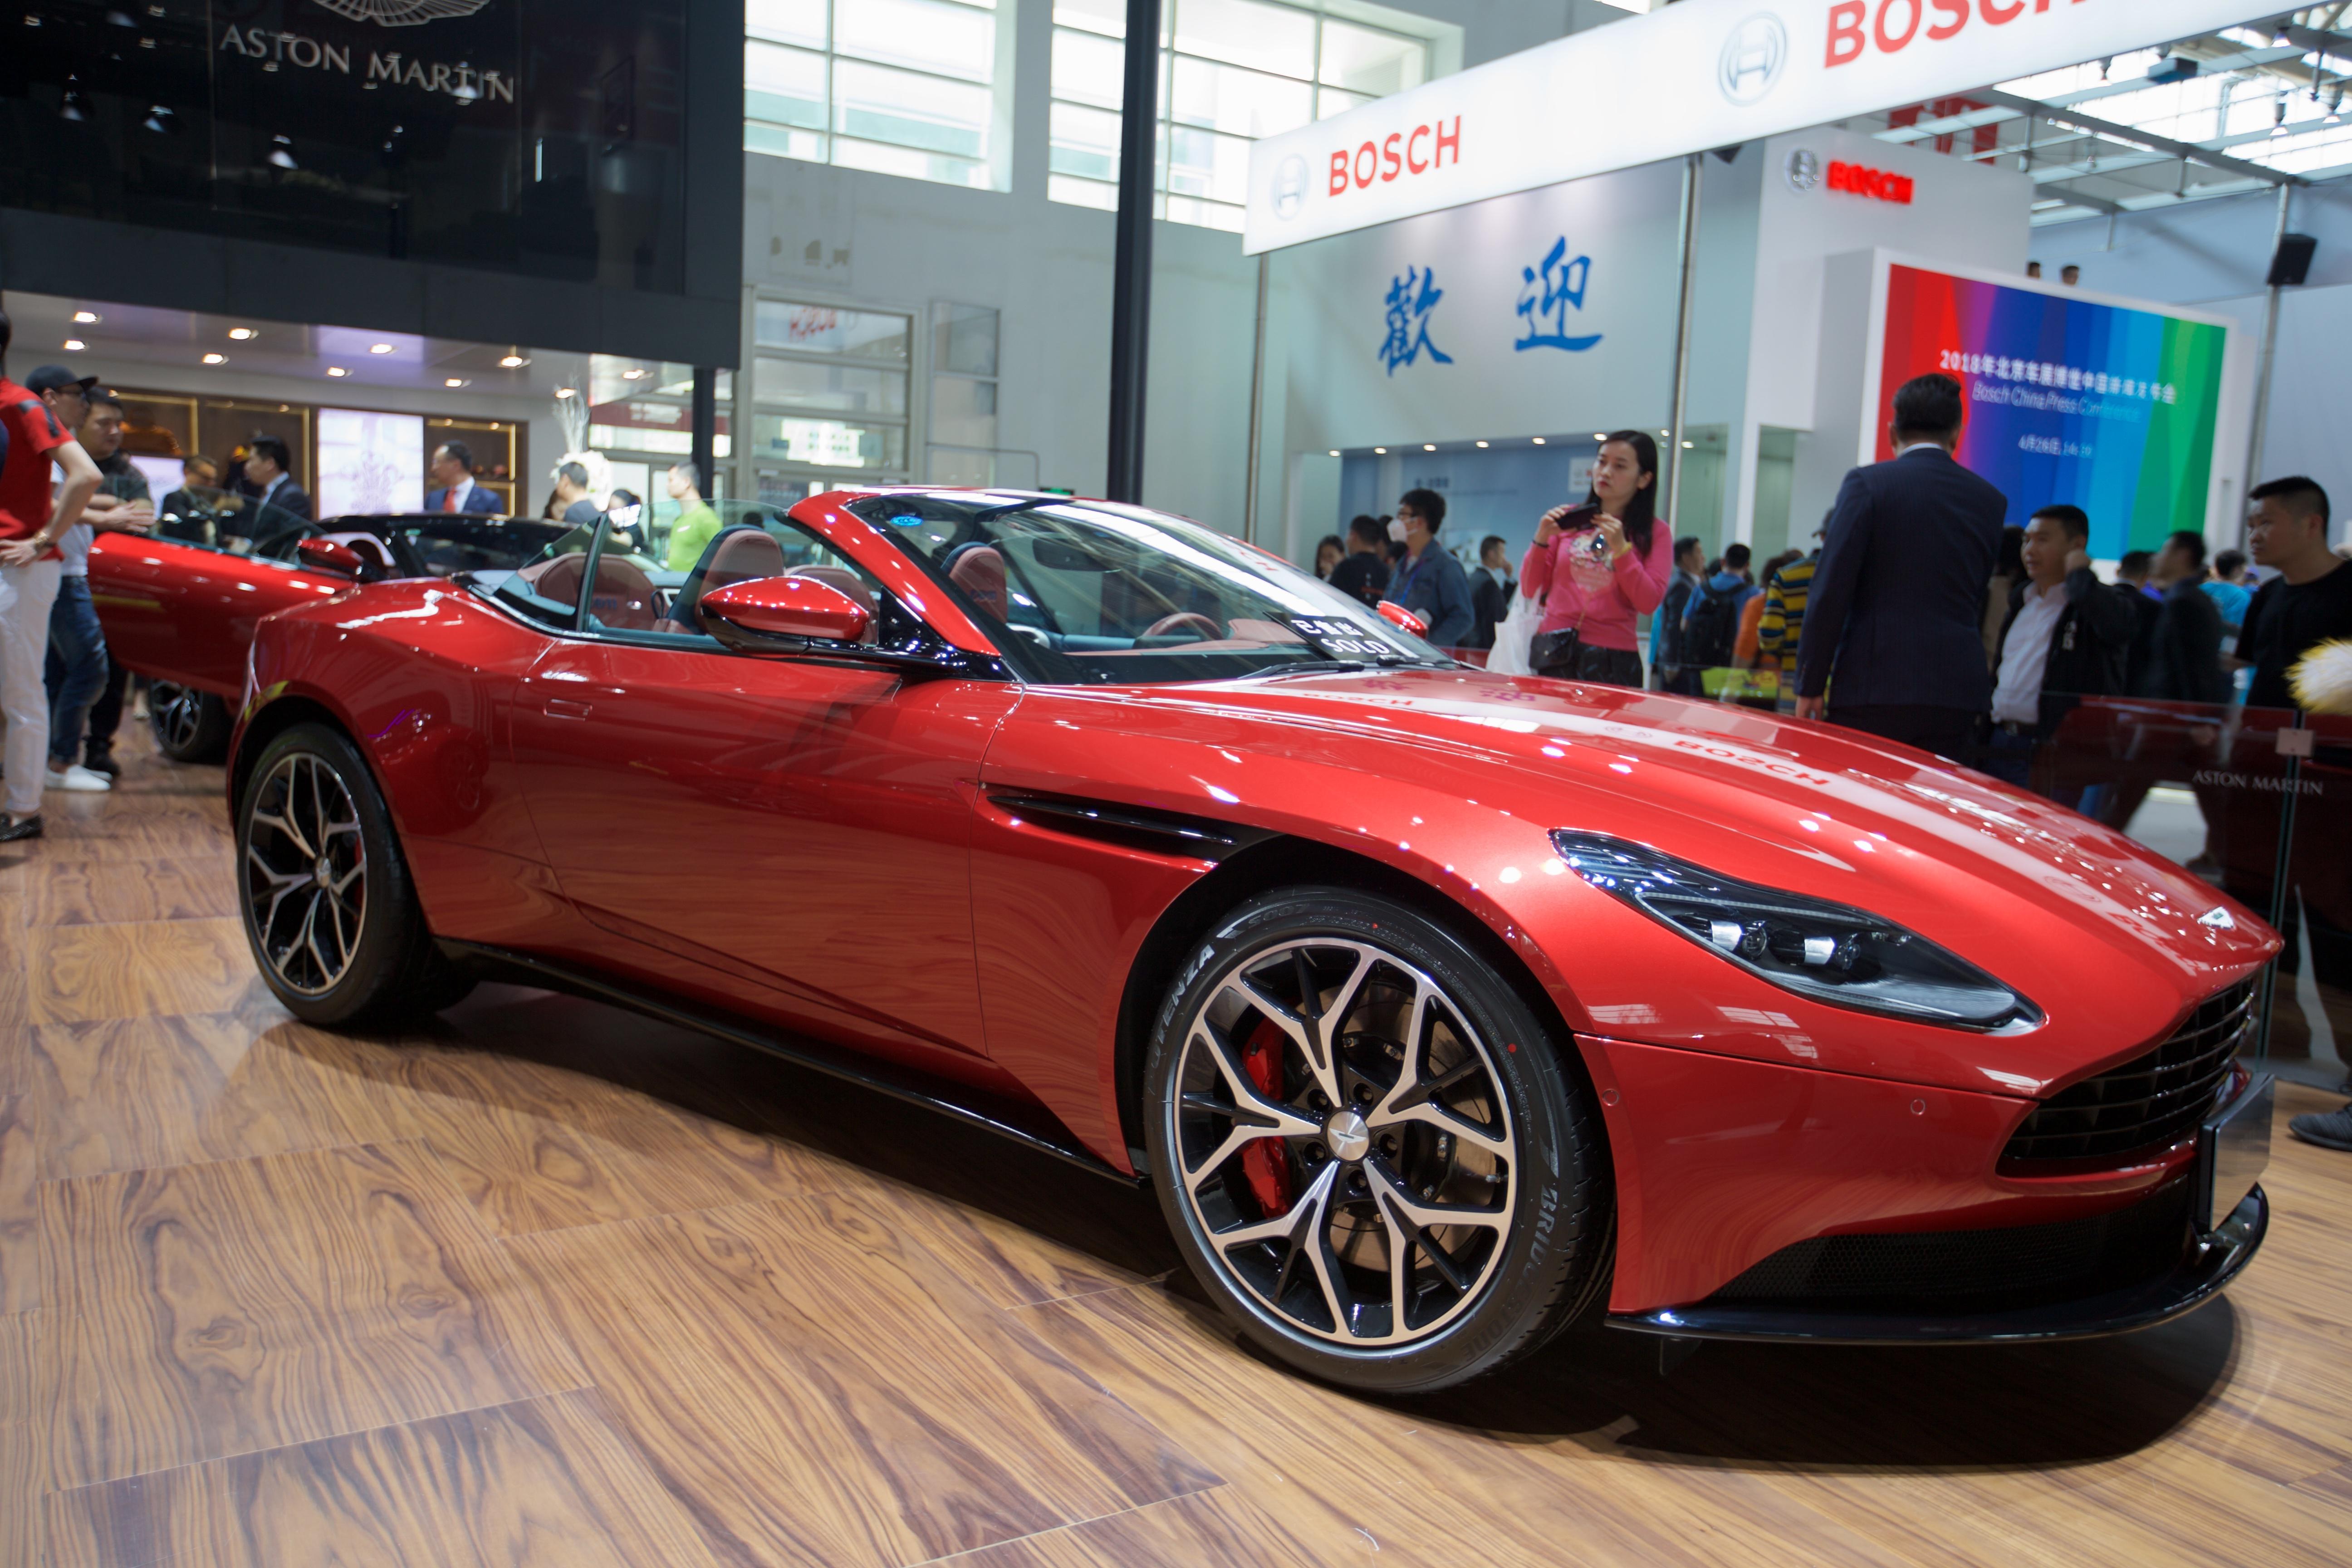 2018 Beijing International Automotive Exhibition (Auto China 2018)